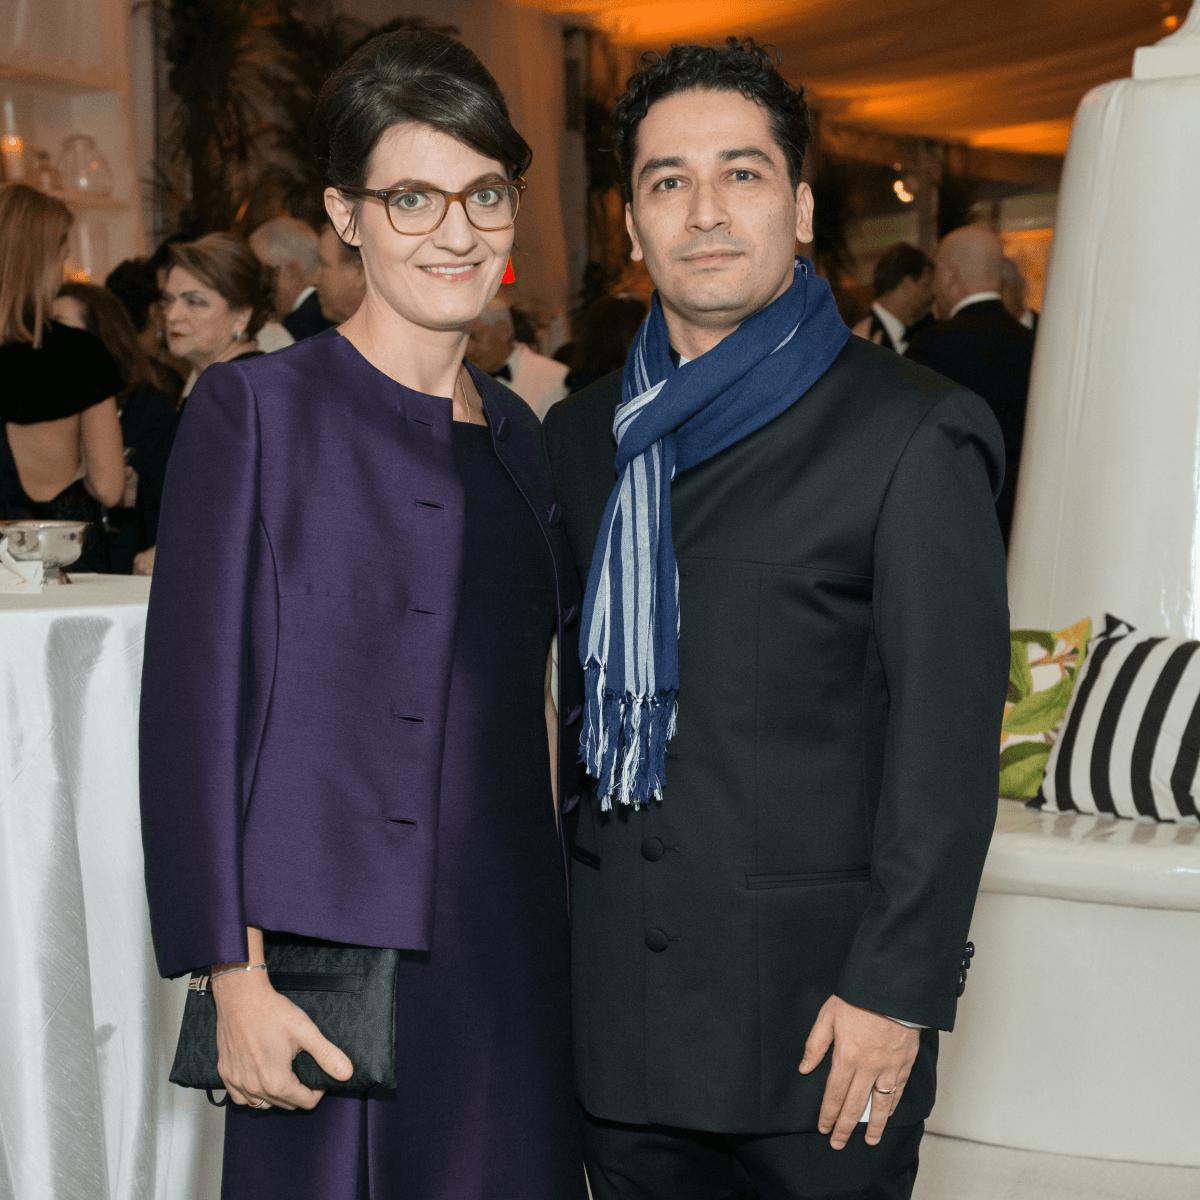 Jones Hall 50th Ball, Julia and Andres Orozco Estrada (Houston Symphony conductor)